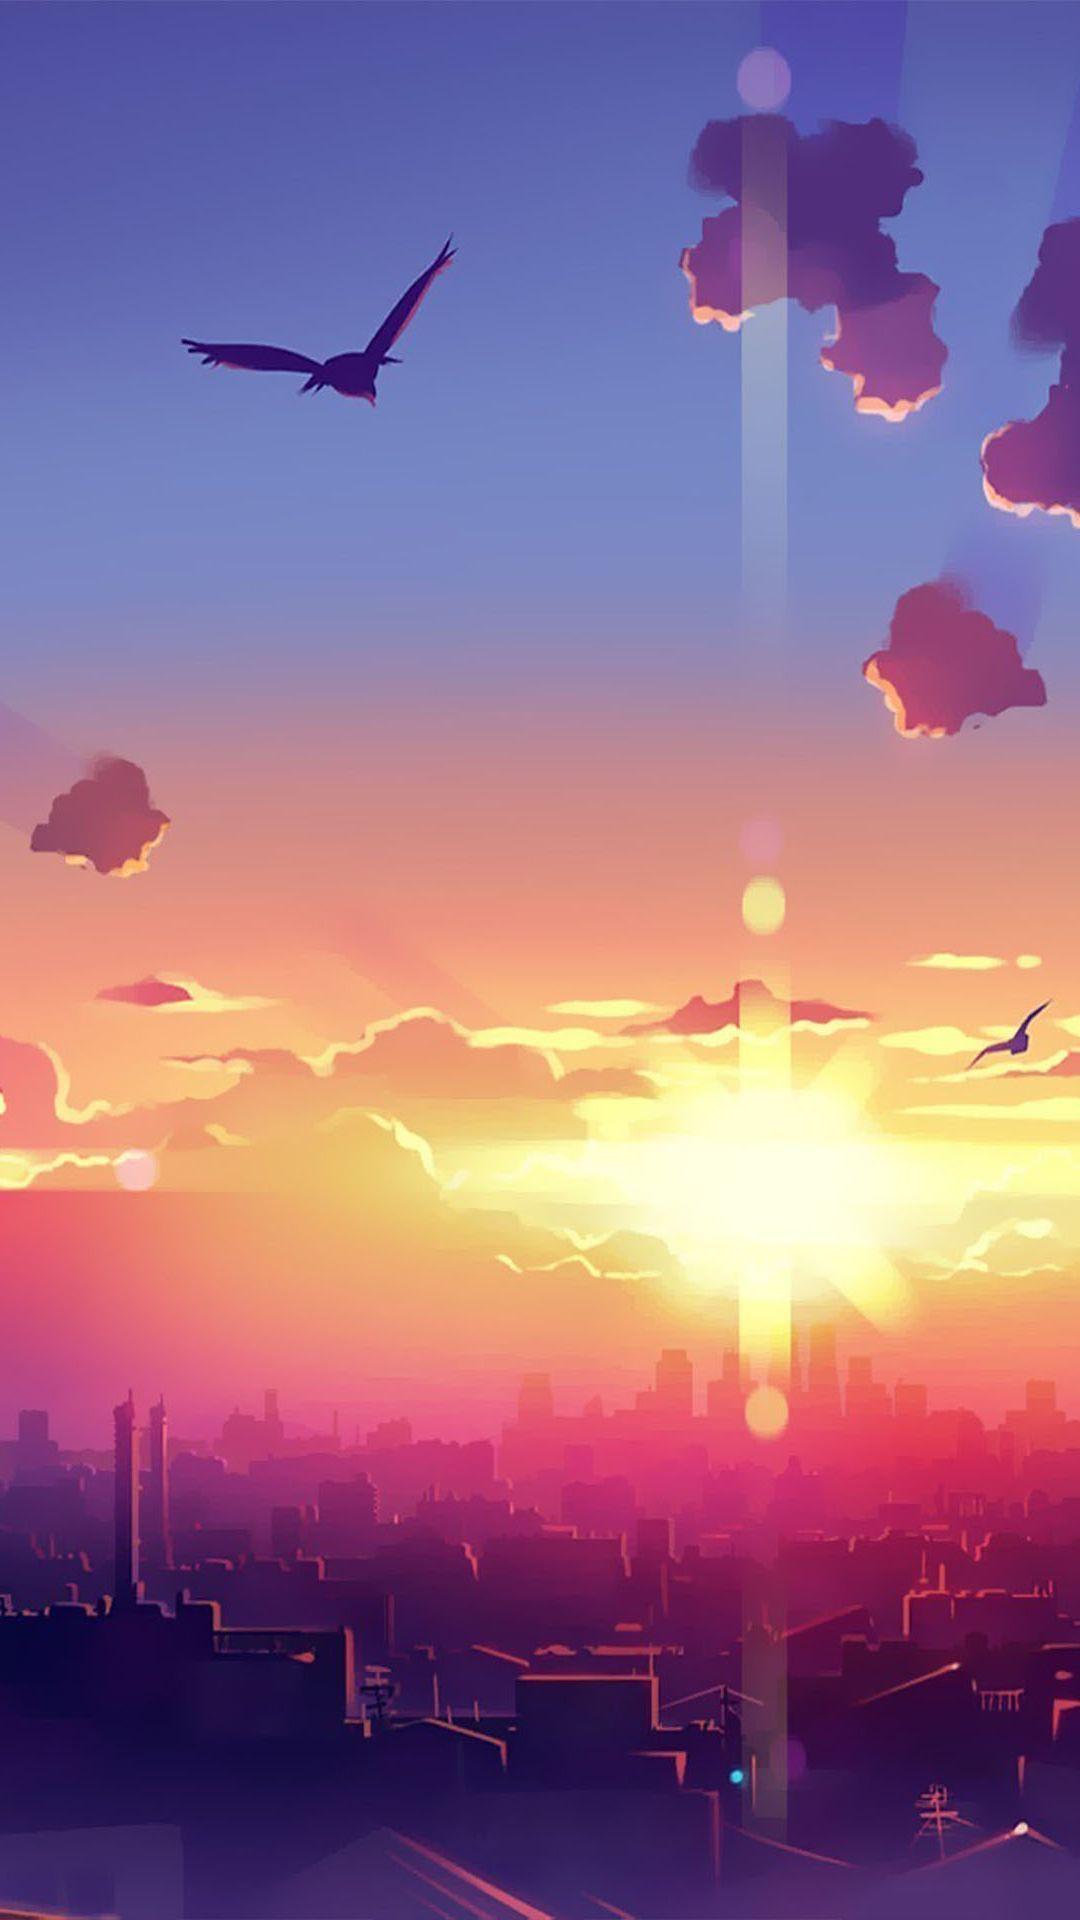 List Of Latest Anime Wallpaper Iphone Scenery Oboi Iphone Wallpaper In 2020 Anime Scenery Anime Wallpaper Landscape Wallpaper